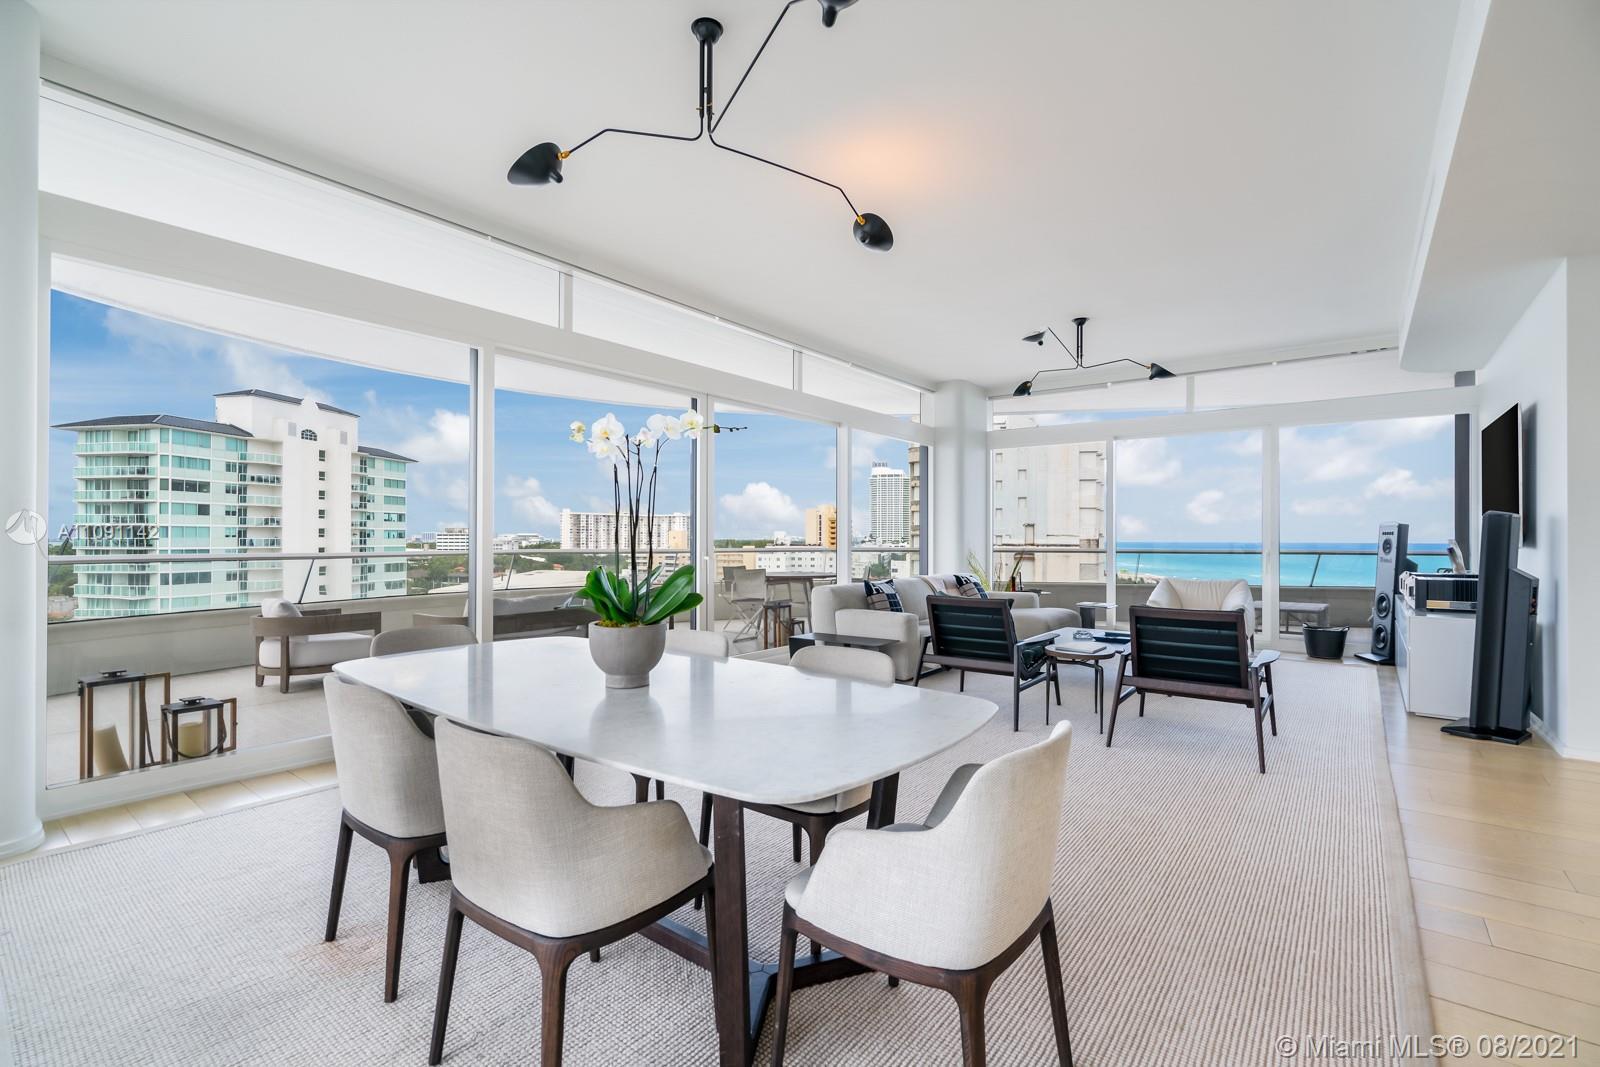 3315 Collins Avenue, Unit #8C Luxury Real Estate